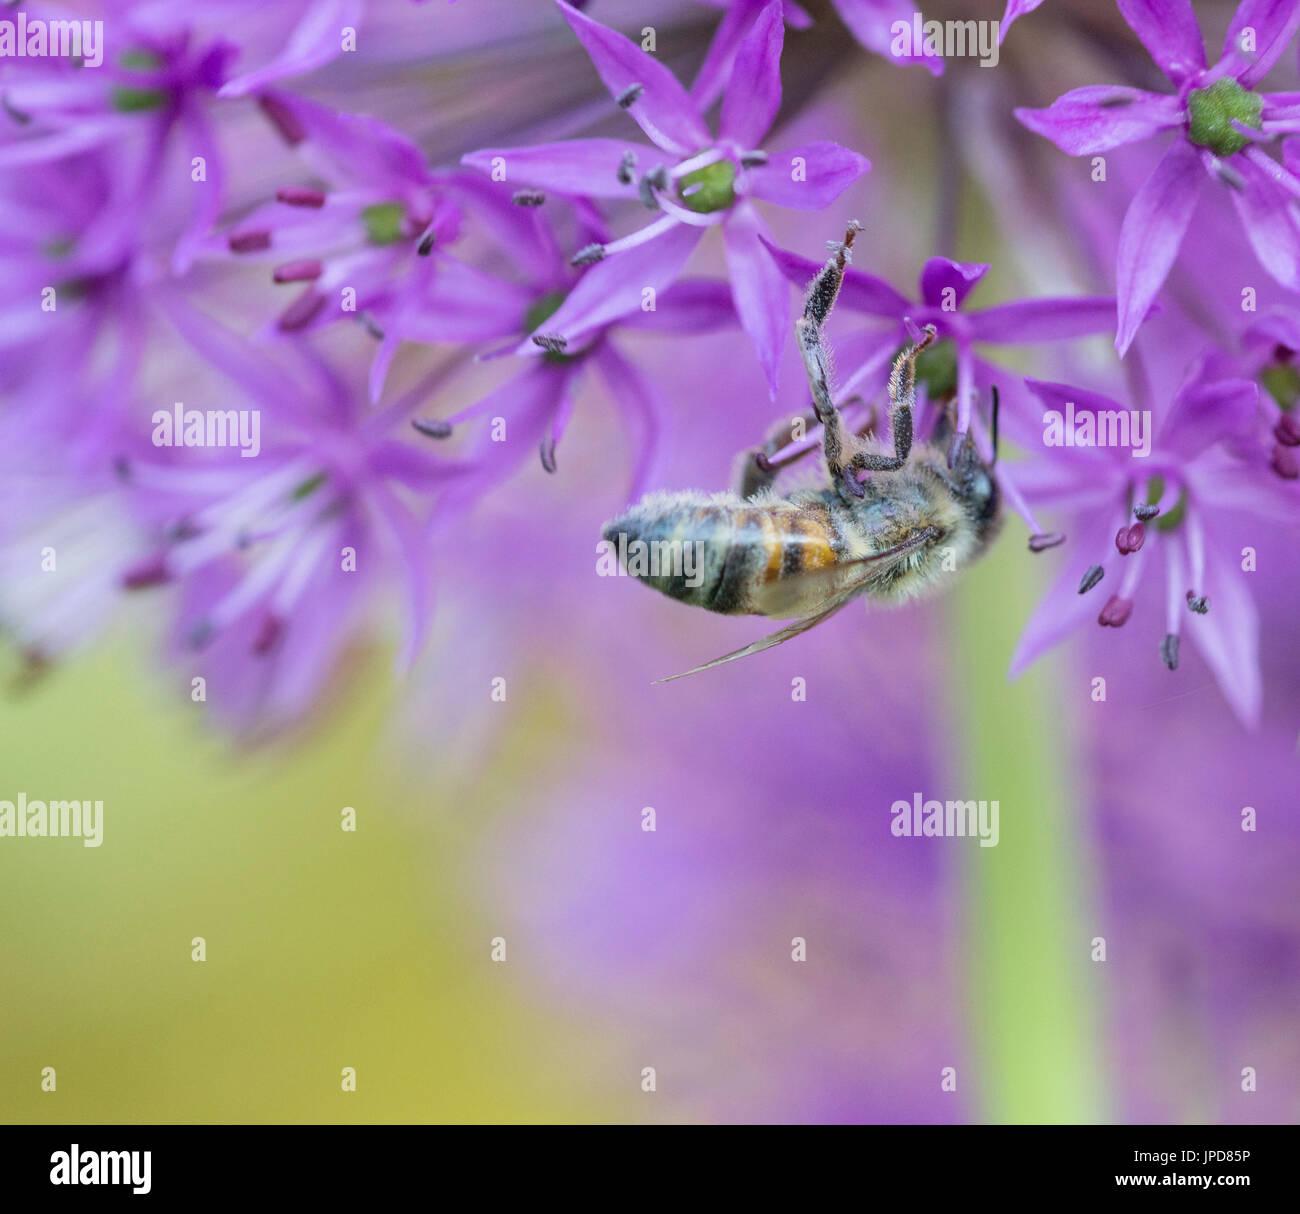 Allium hollandicum 'Purple Sensation' with Bee - Stock Image